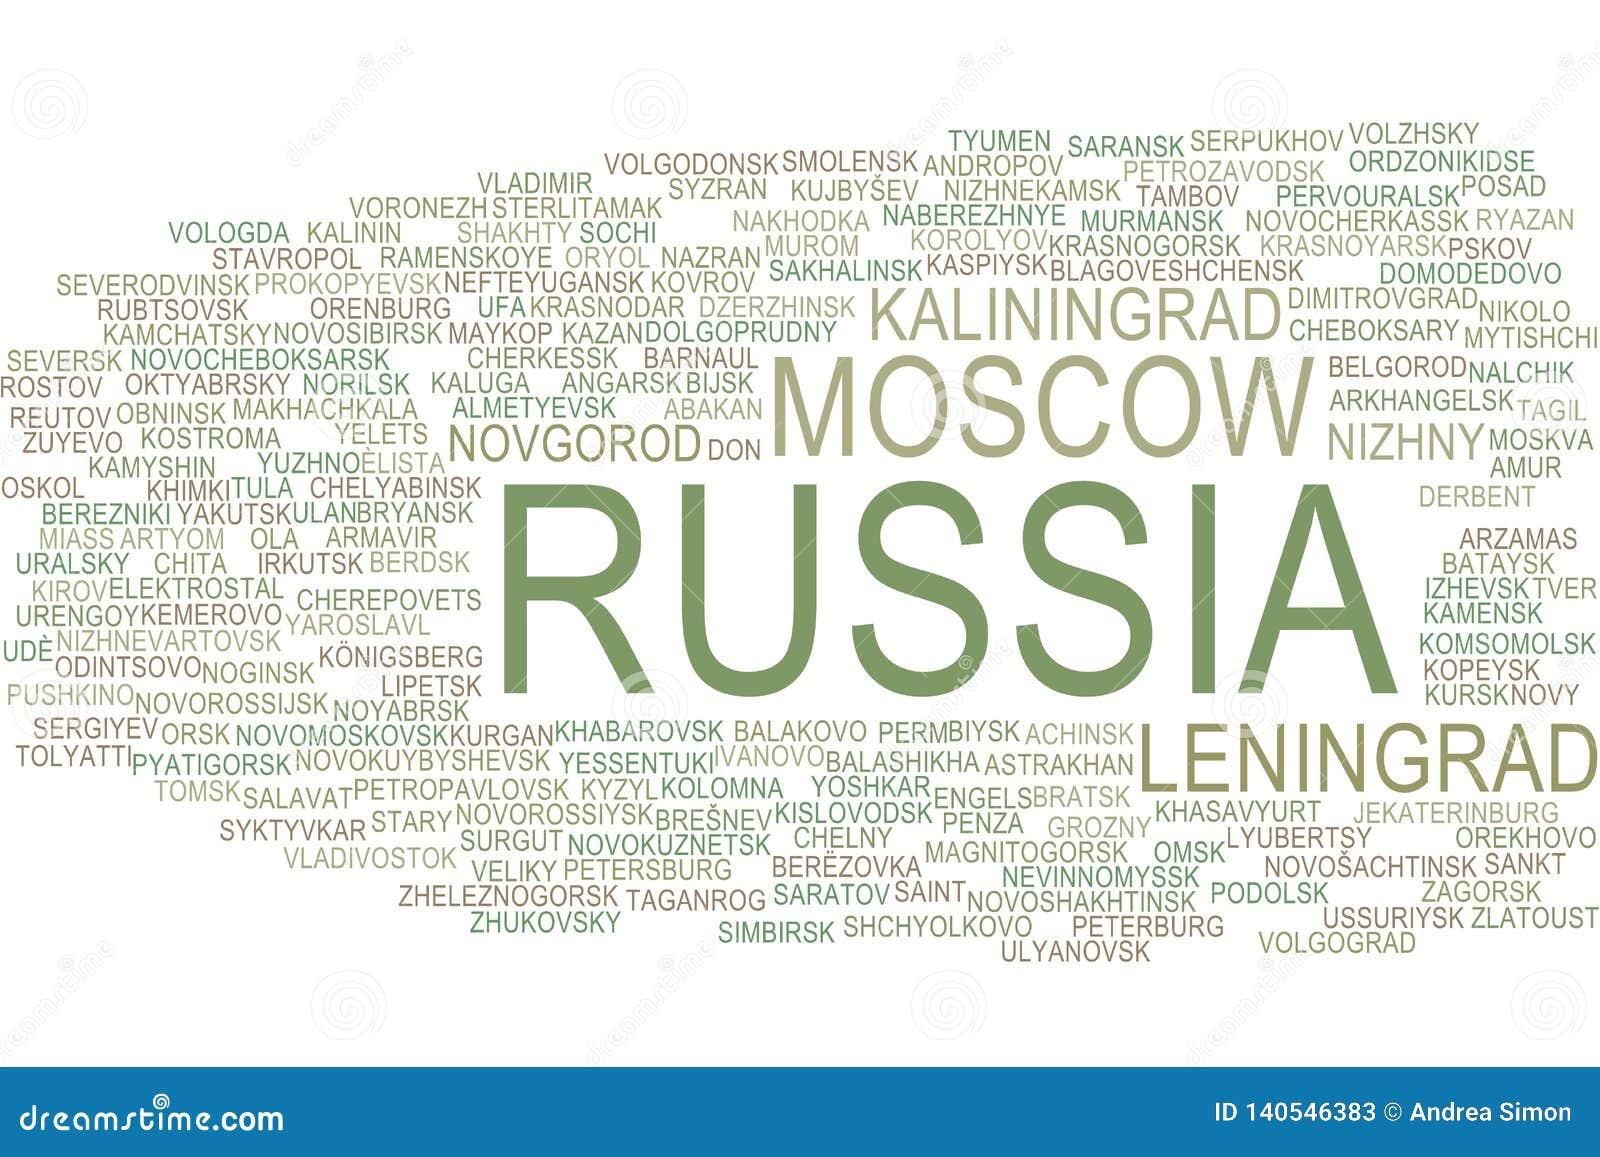 Nuage de mot de la Russie